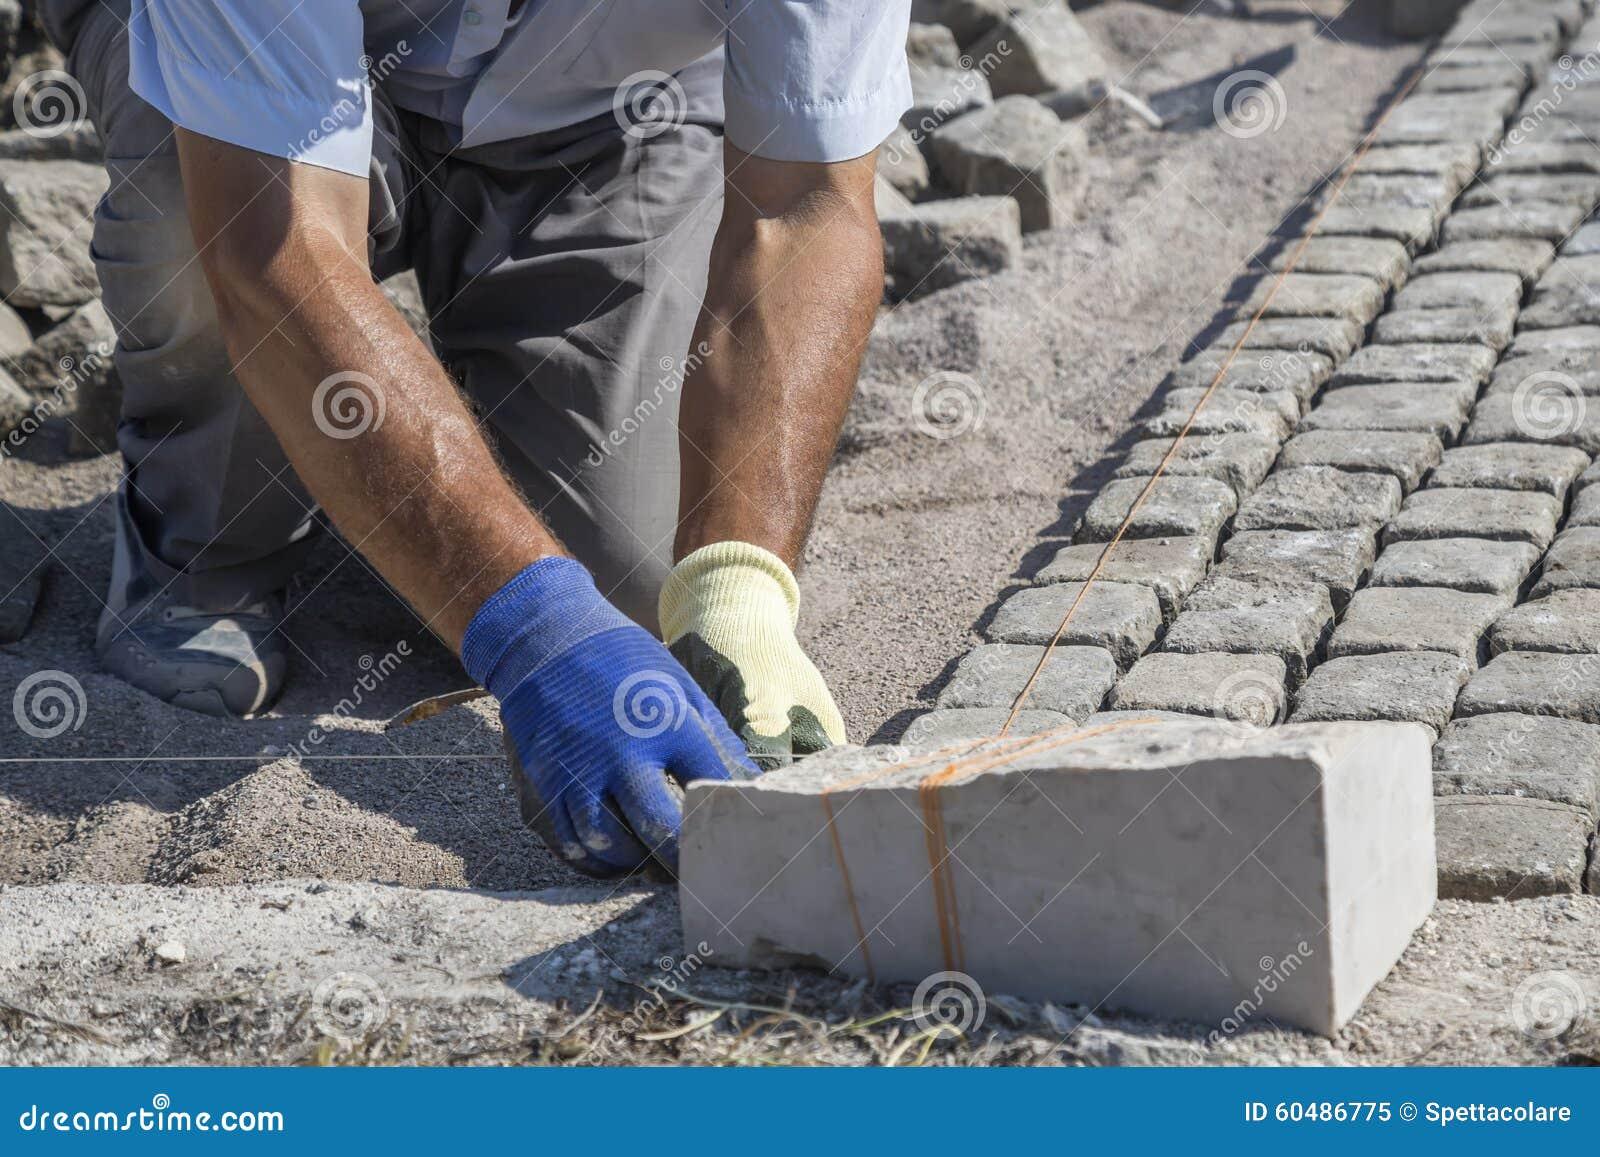 Worker Installing Granite Cubes 2 Stock Image - Image of